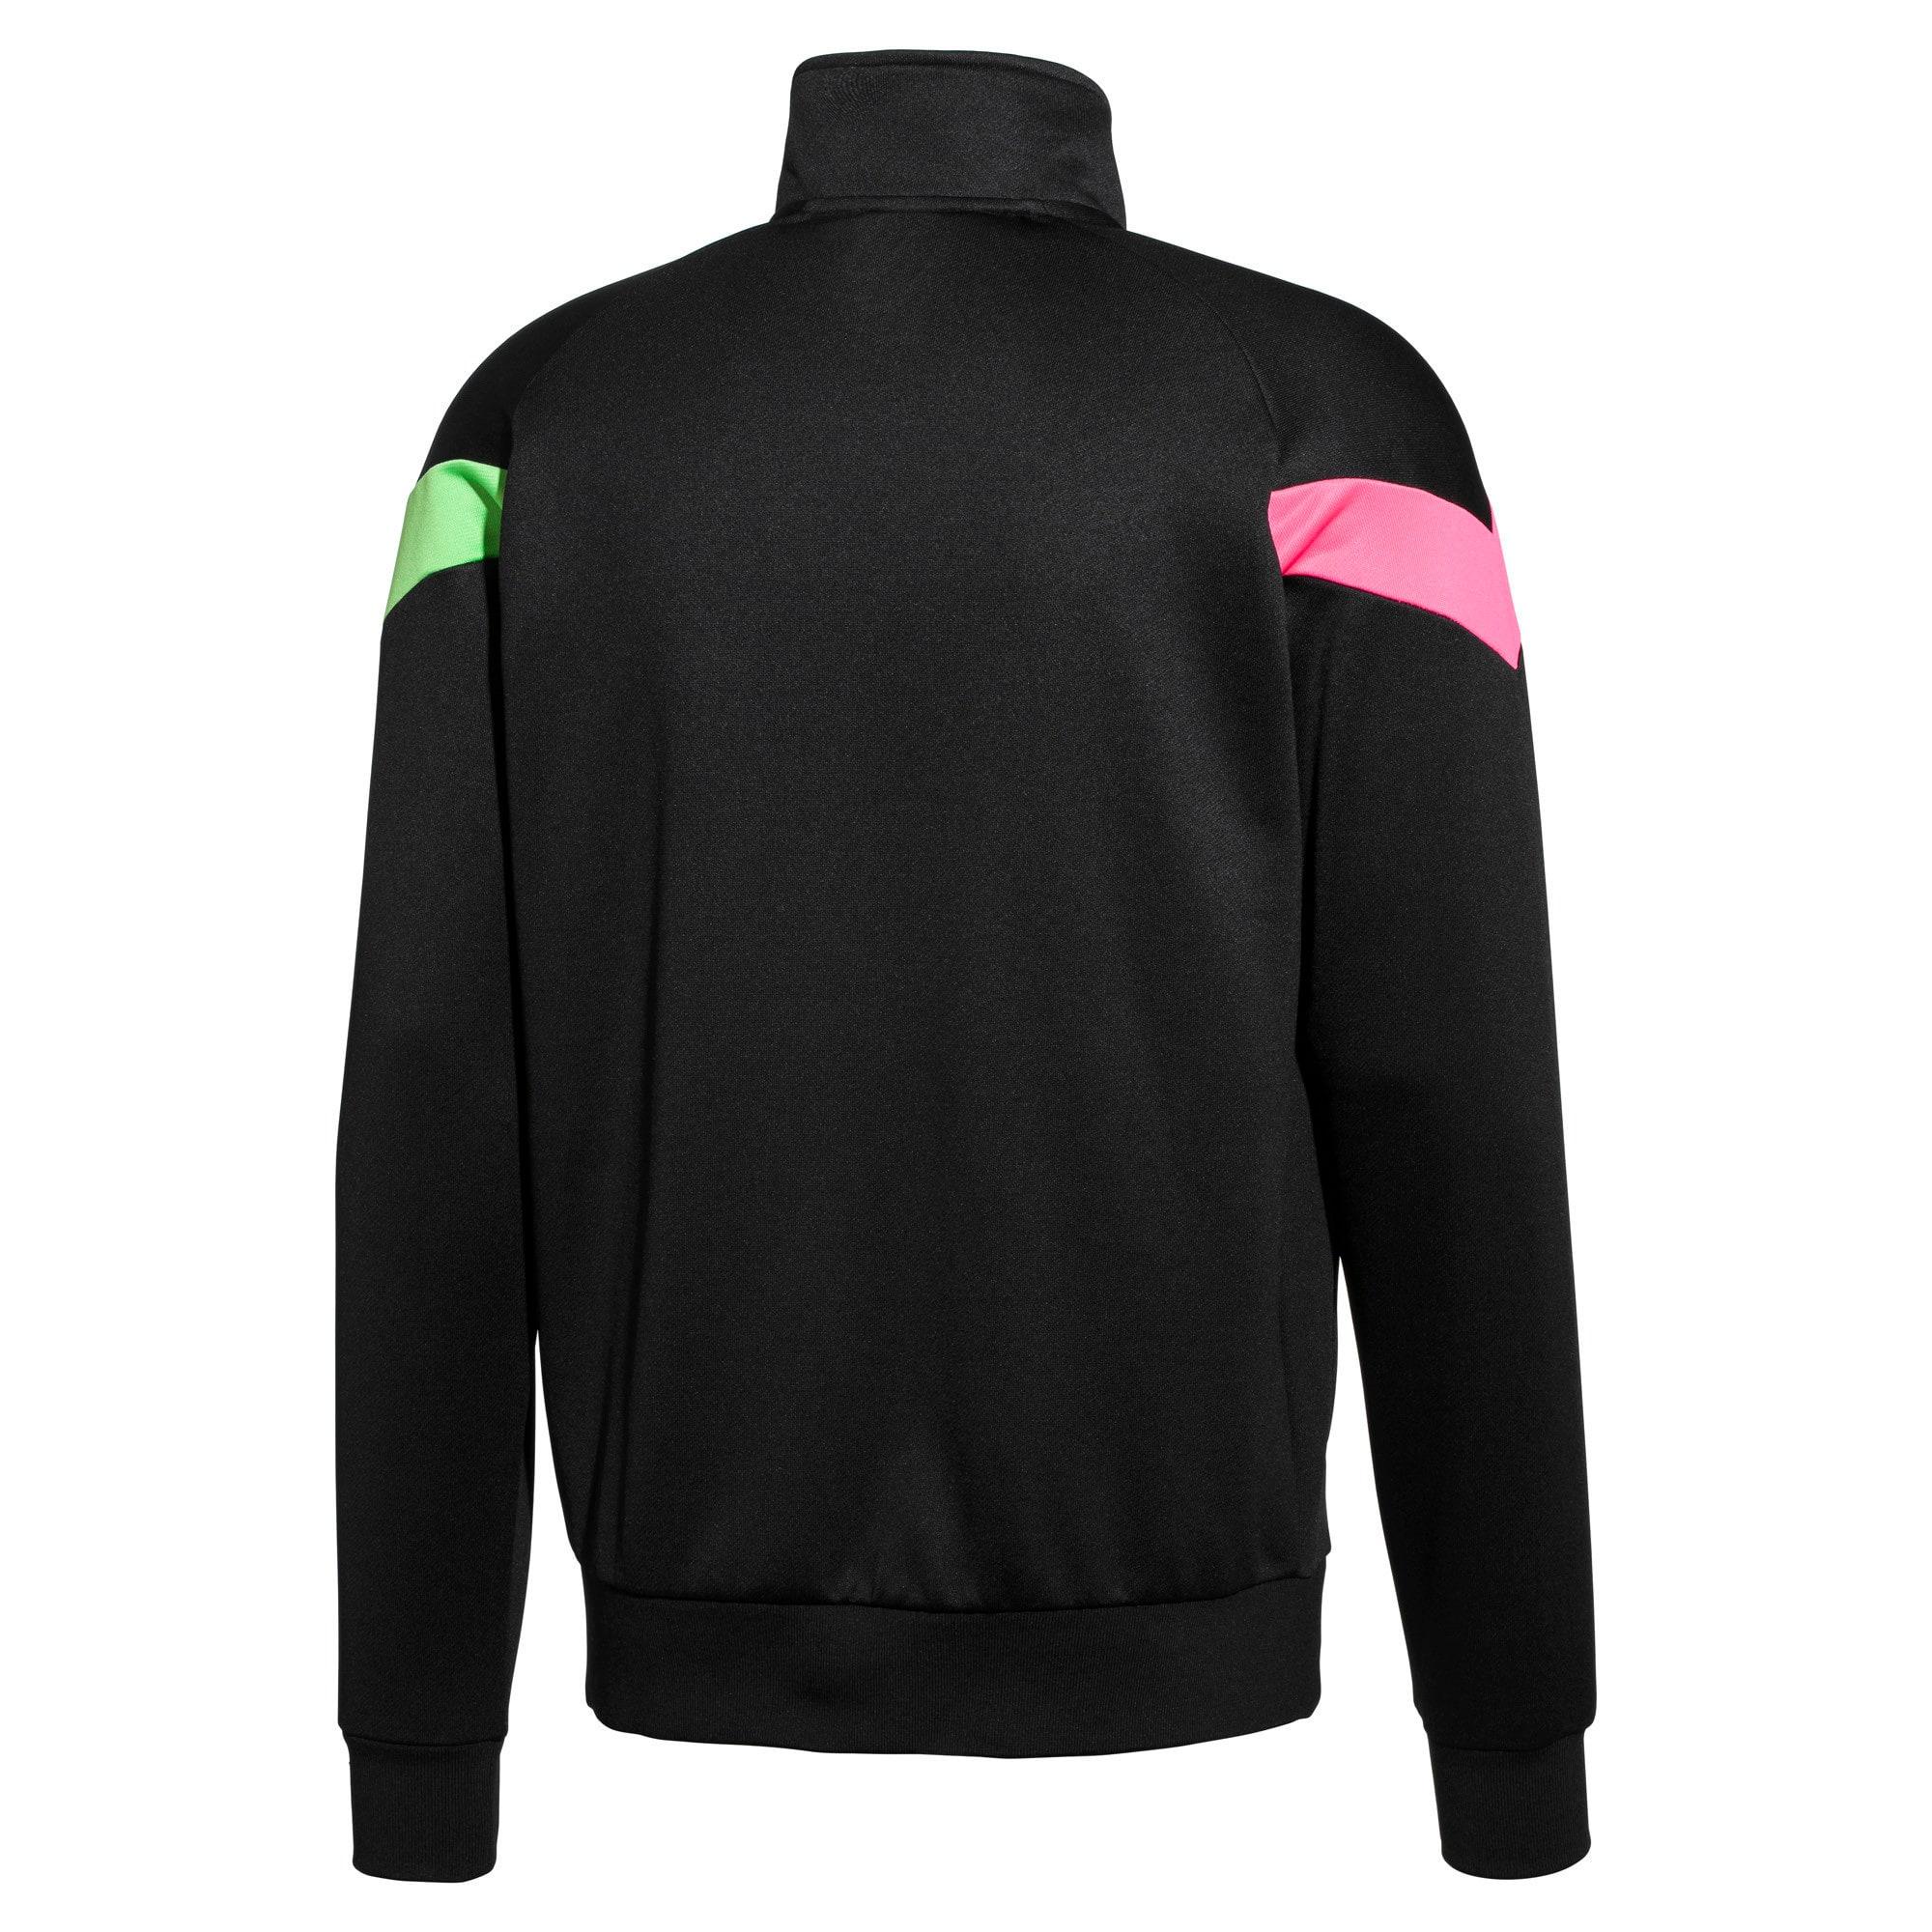 Thumbnail 2 of PUMA x MTV MCS Men's Track Jacket, Puma Black, medium